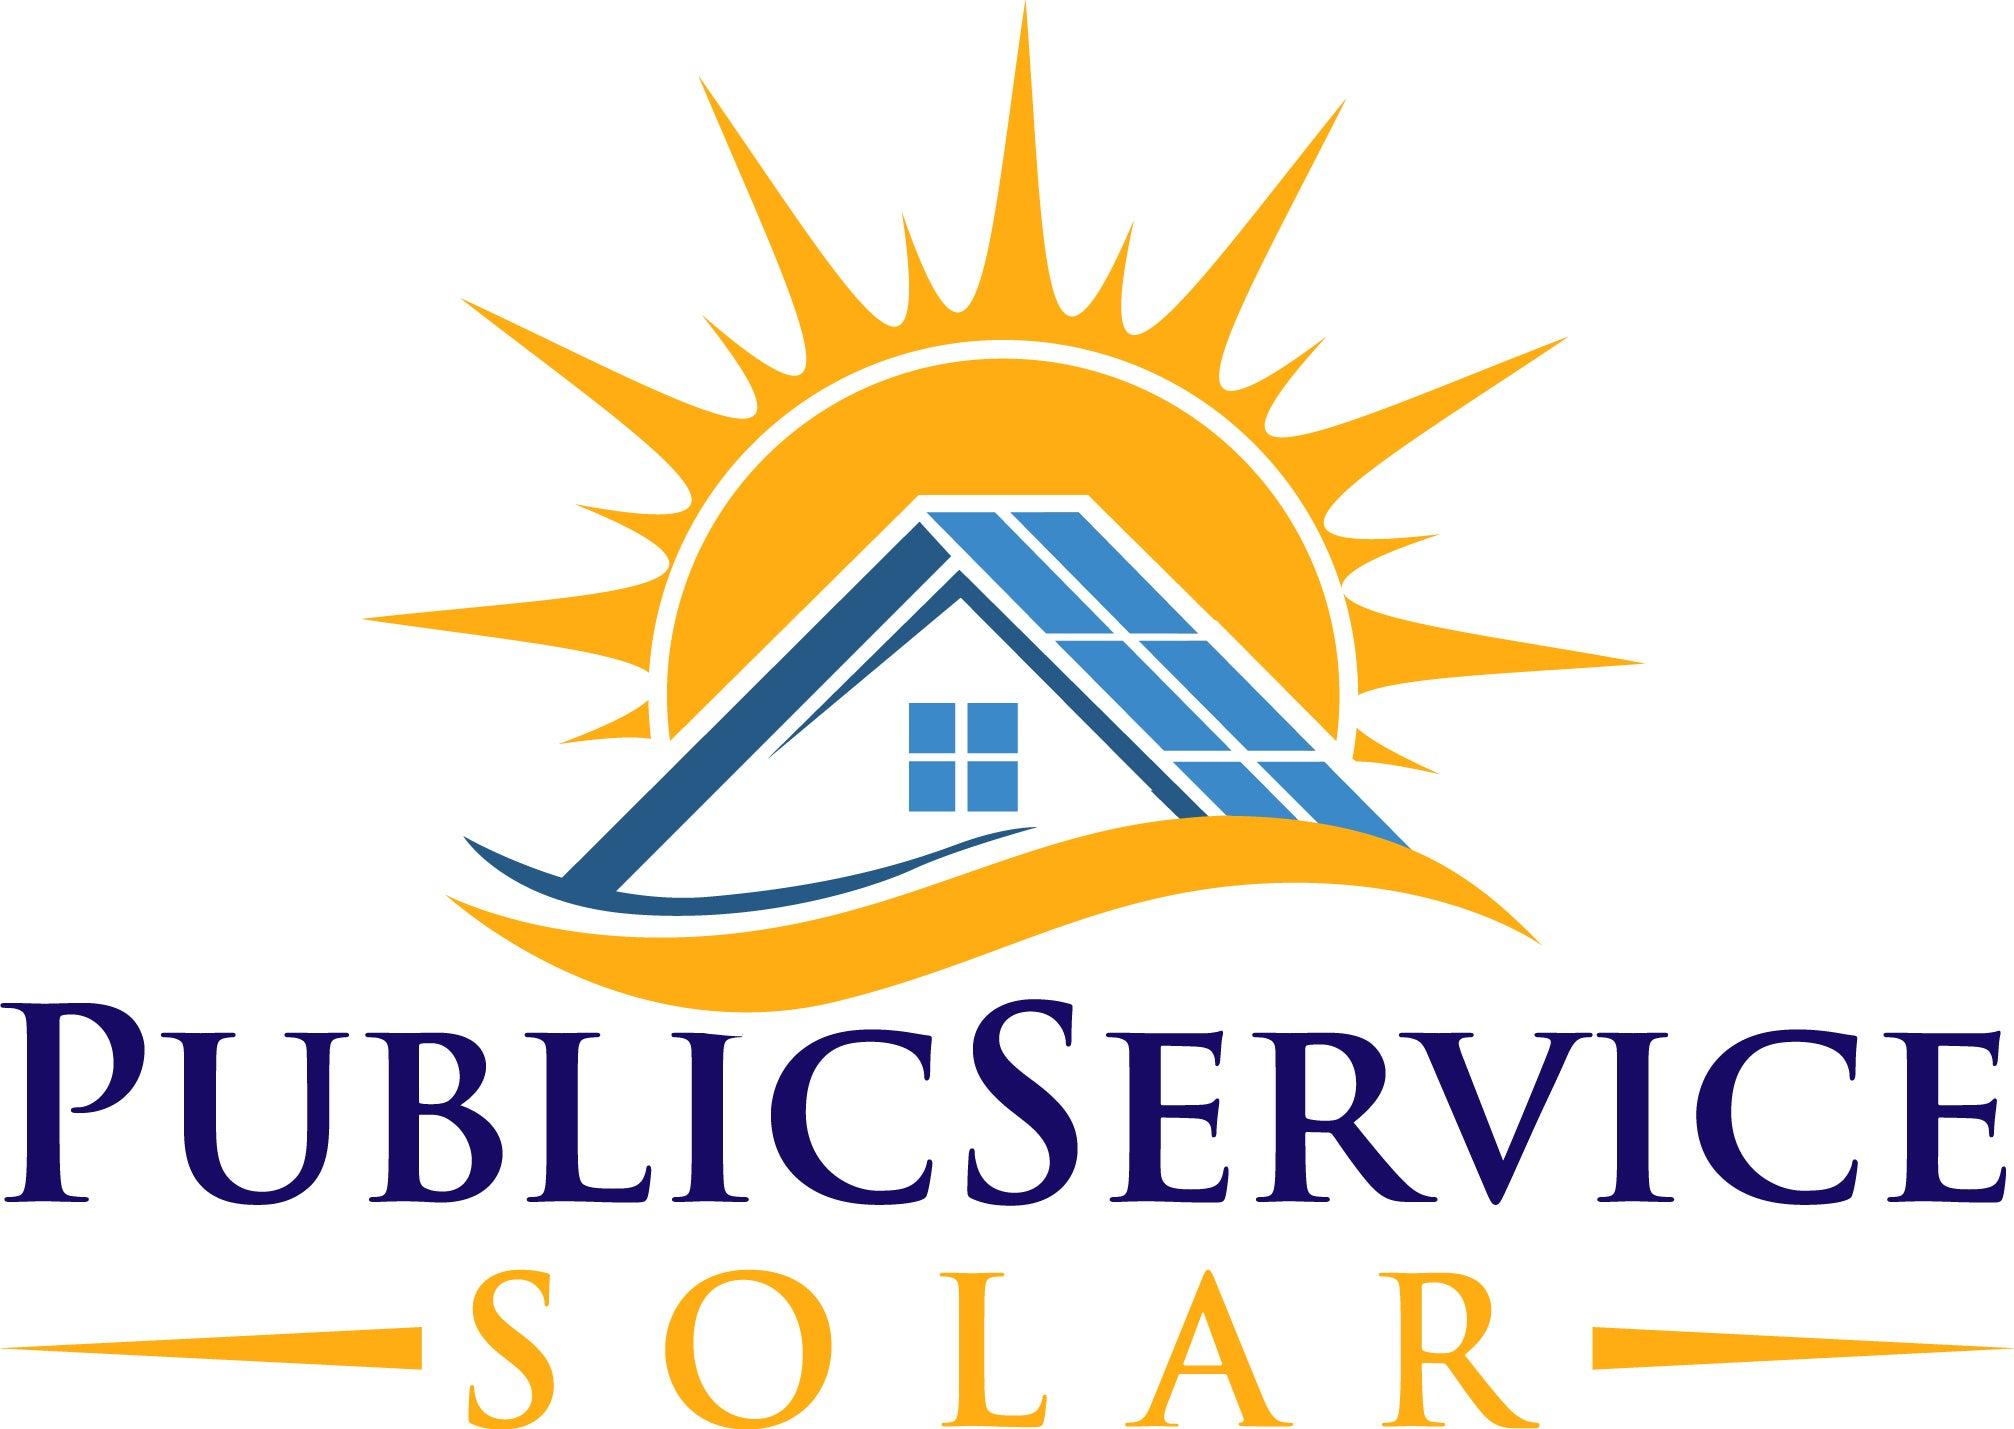 Public Service Solar